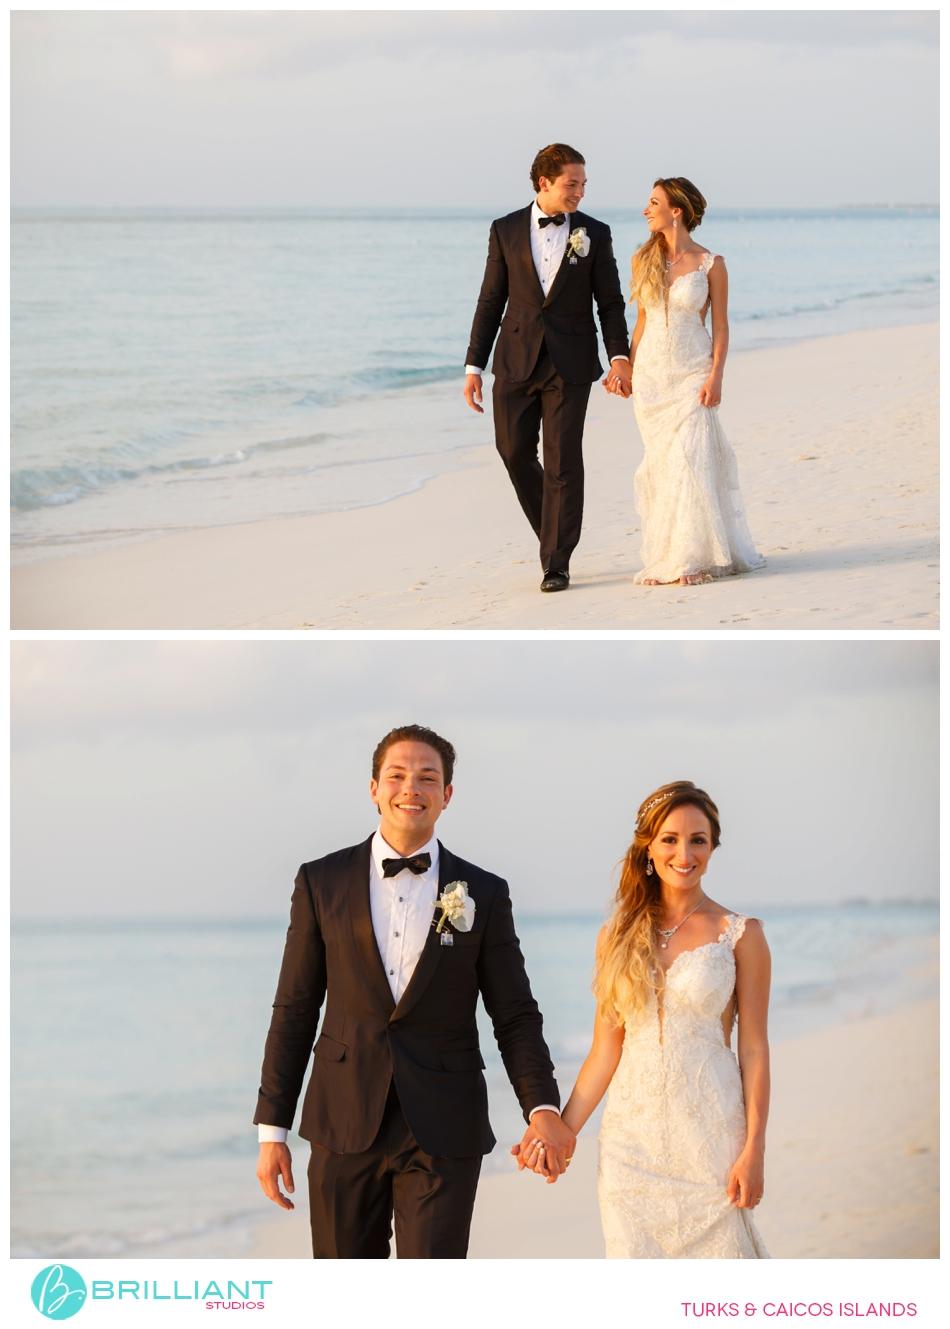 turks and caicos wedding